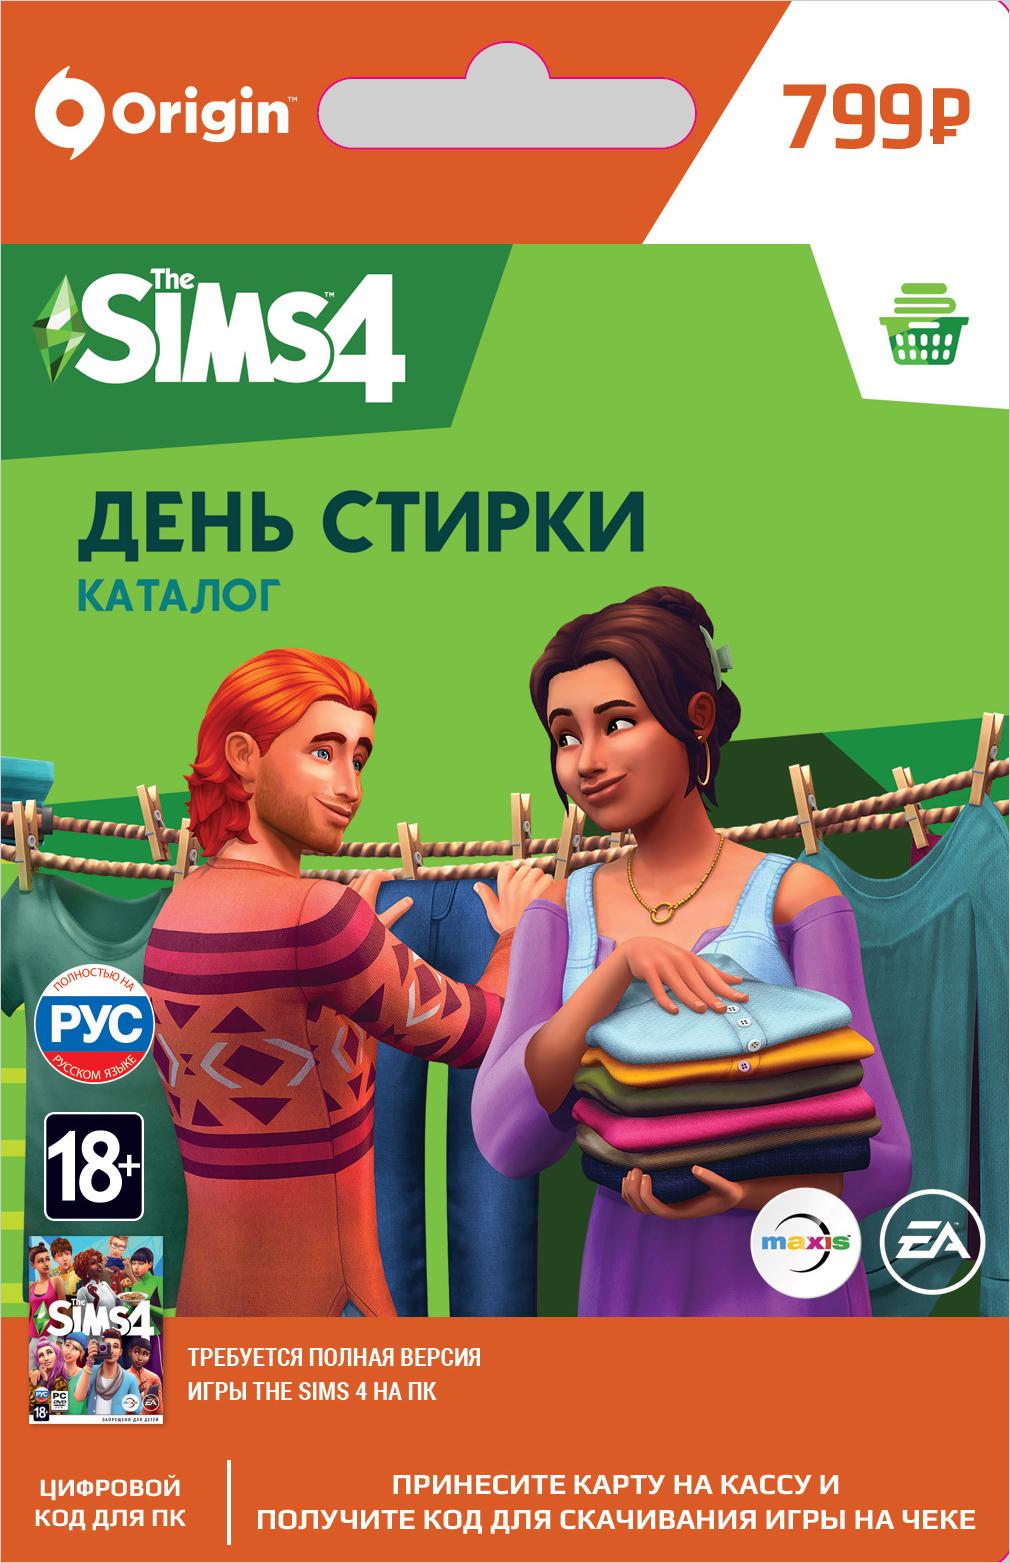 The Sims 4 День стирки. Каталог [PC, Цифровая версия] (Цифровая версия)